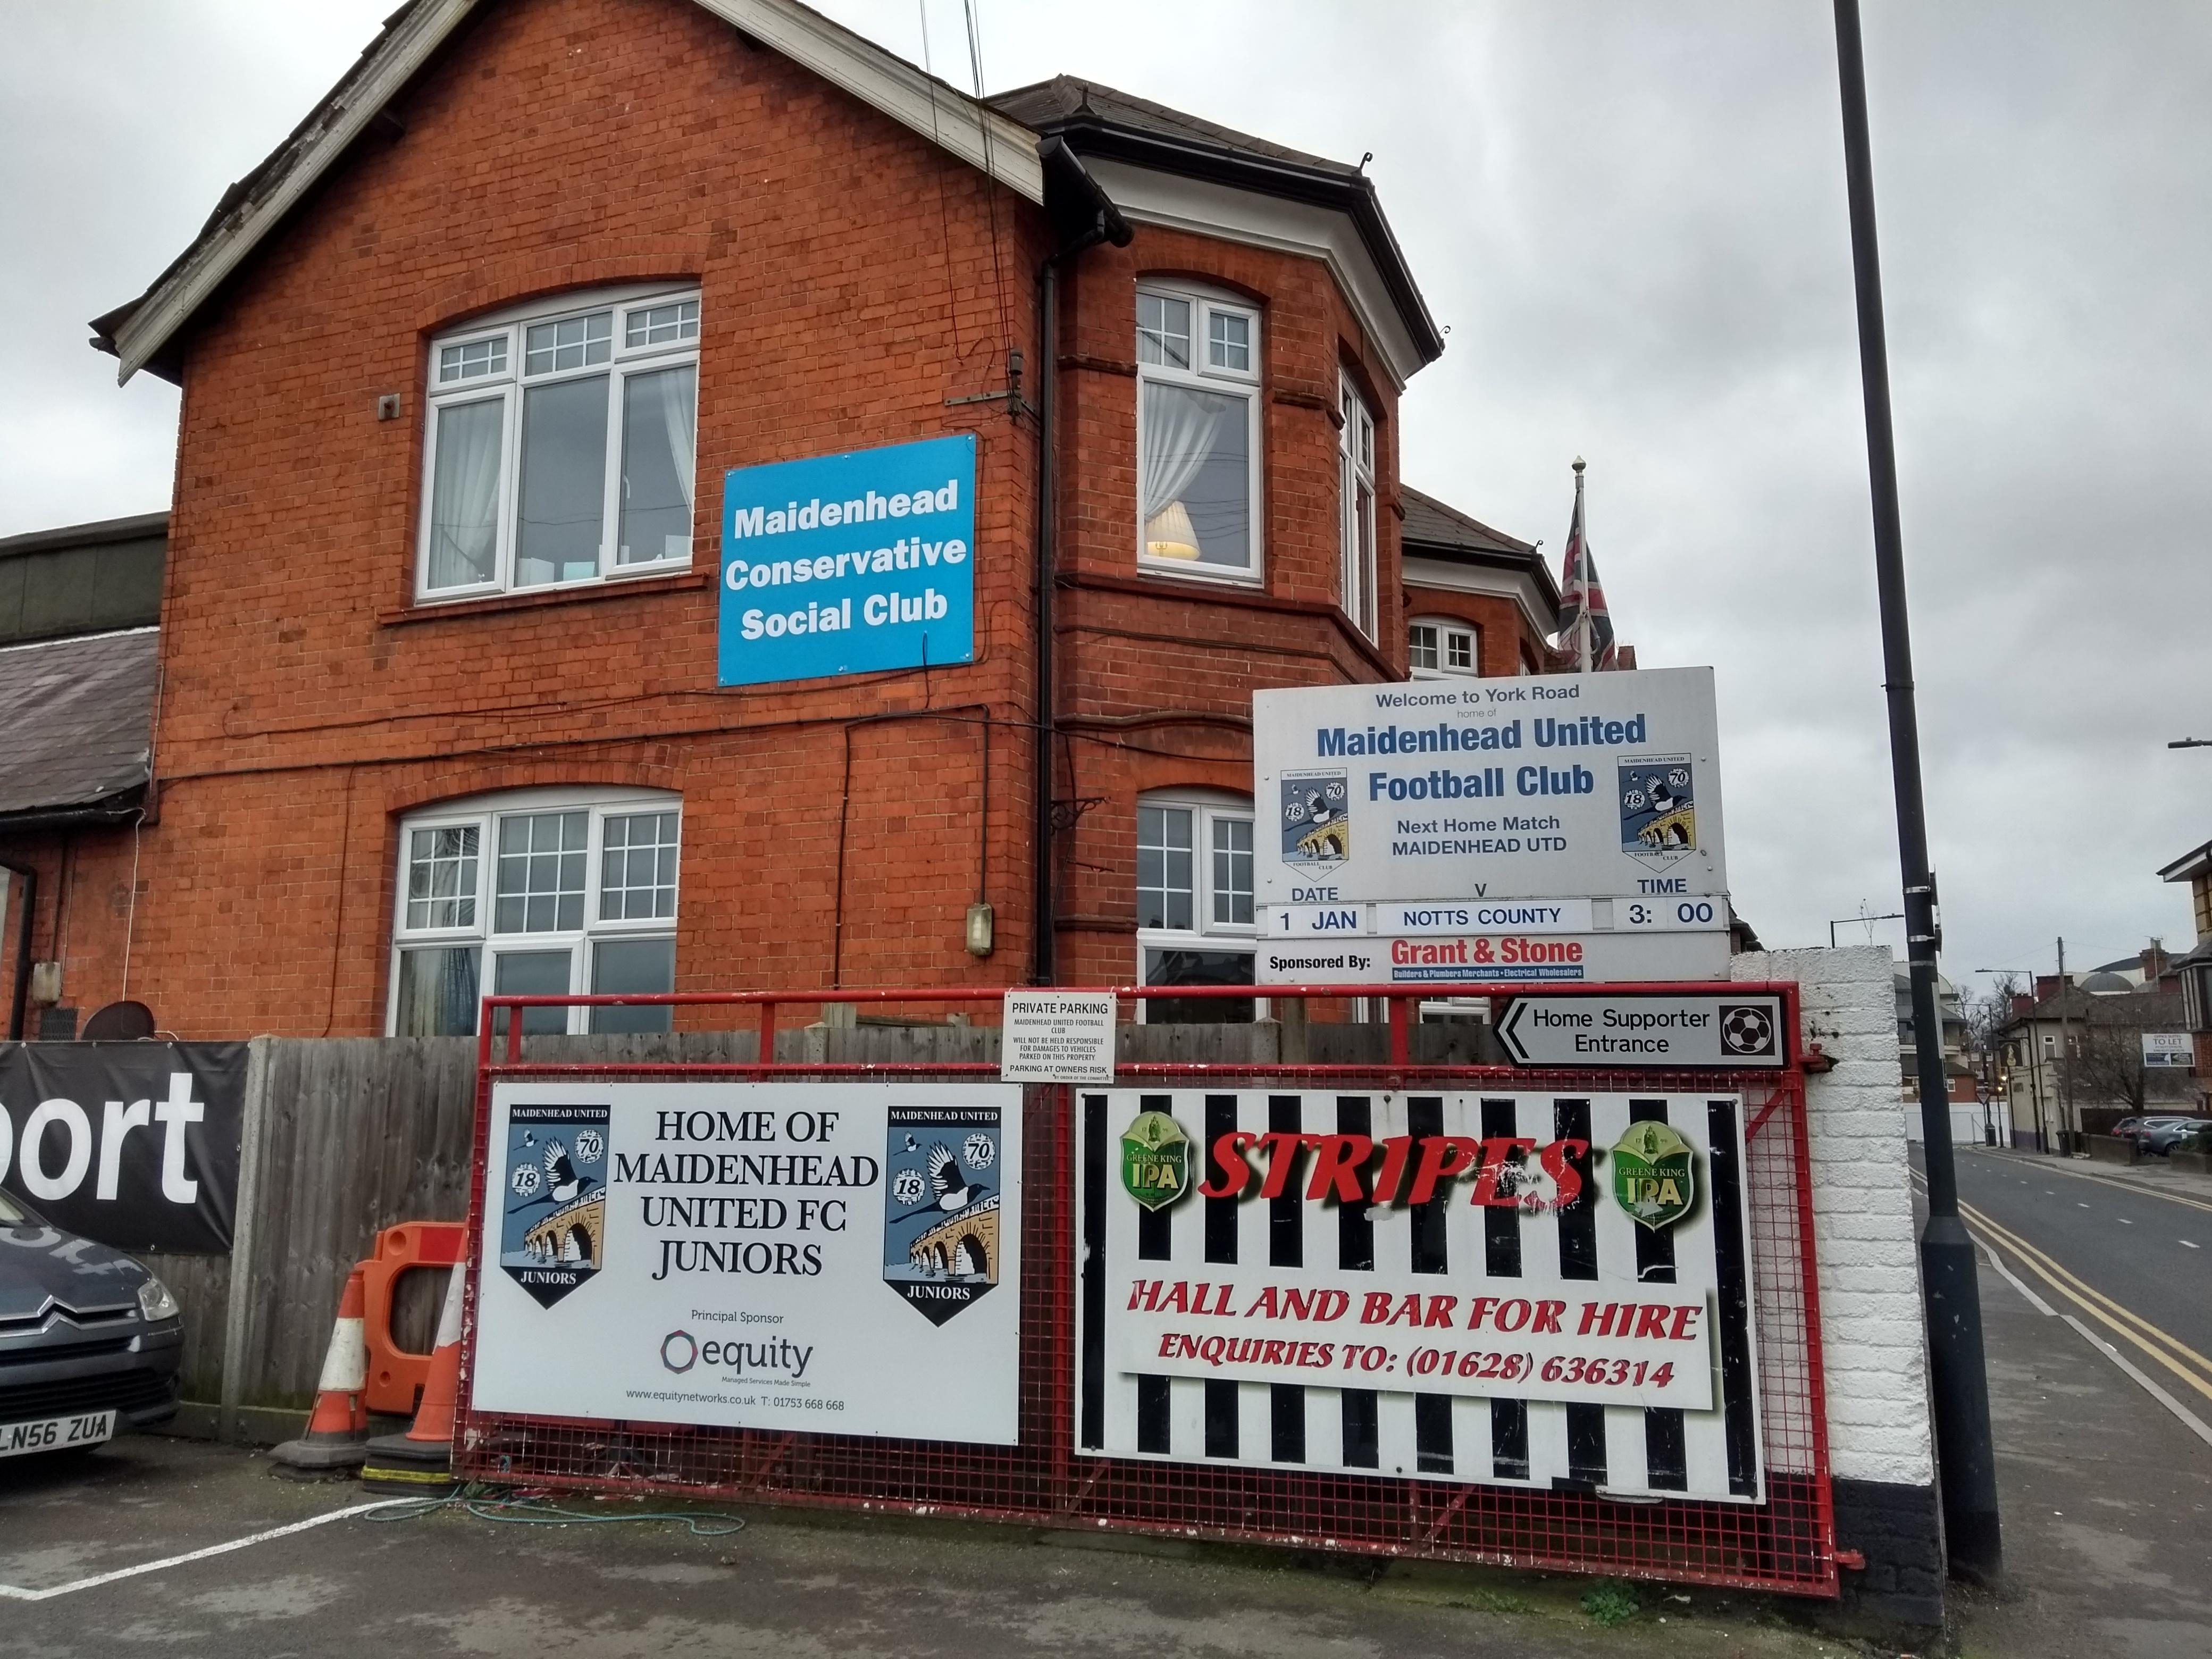 Entrance to Maidenhead United FC